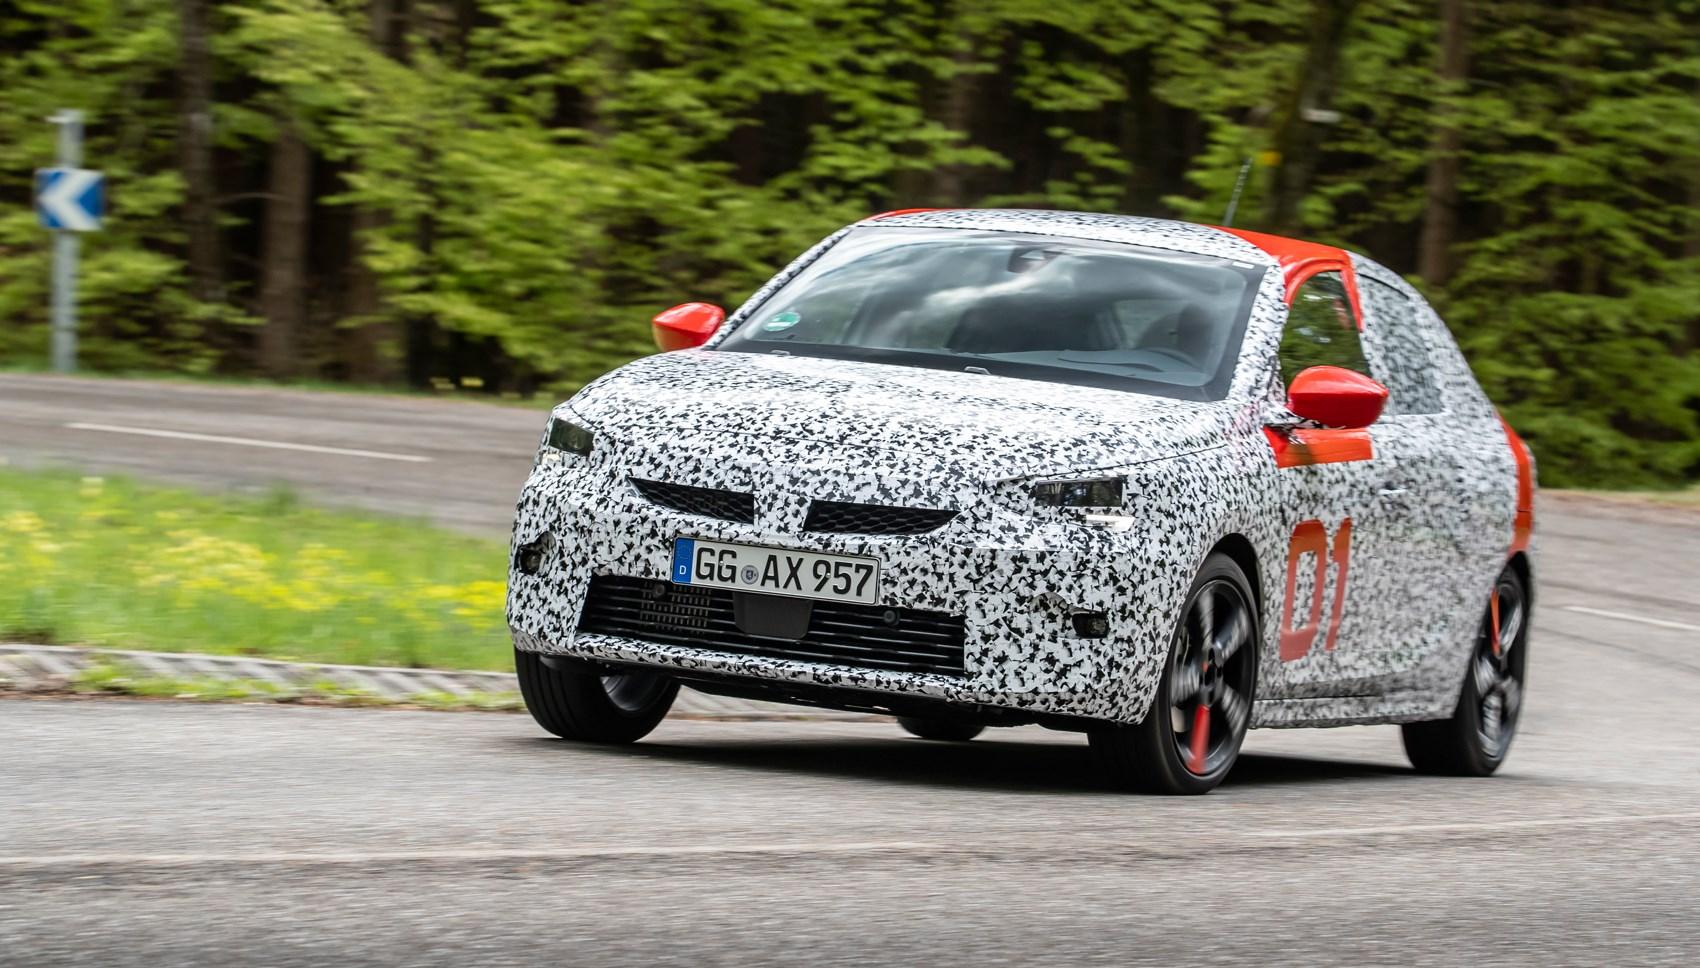 Vauxhall Corsa pre-production cornering